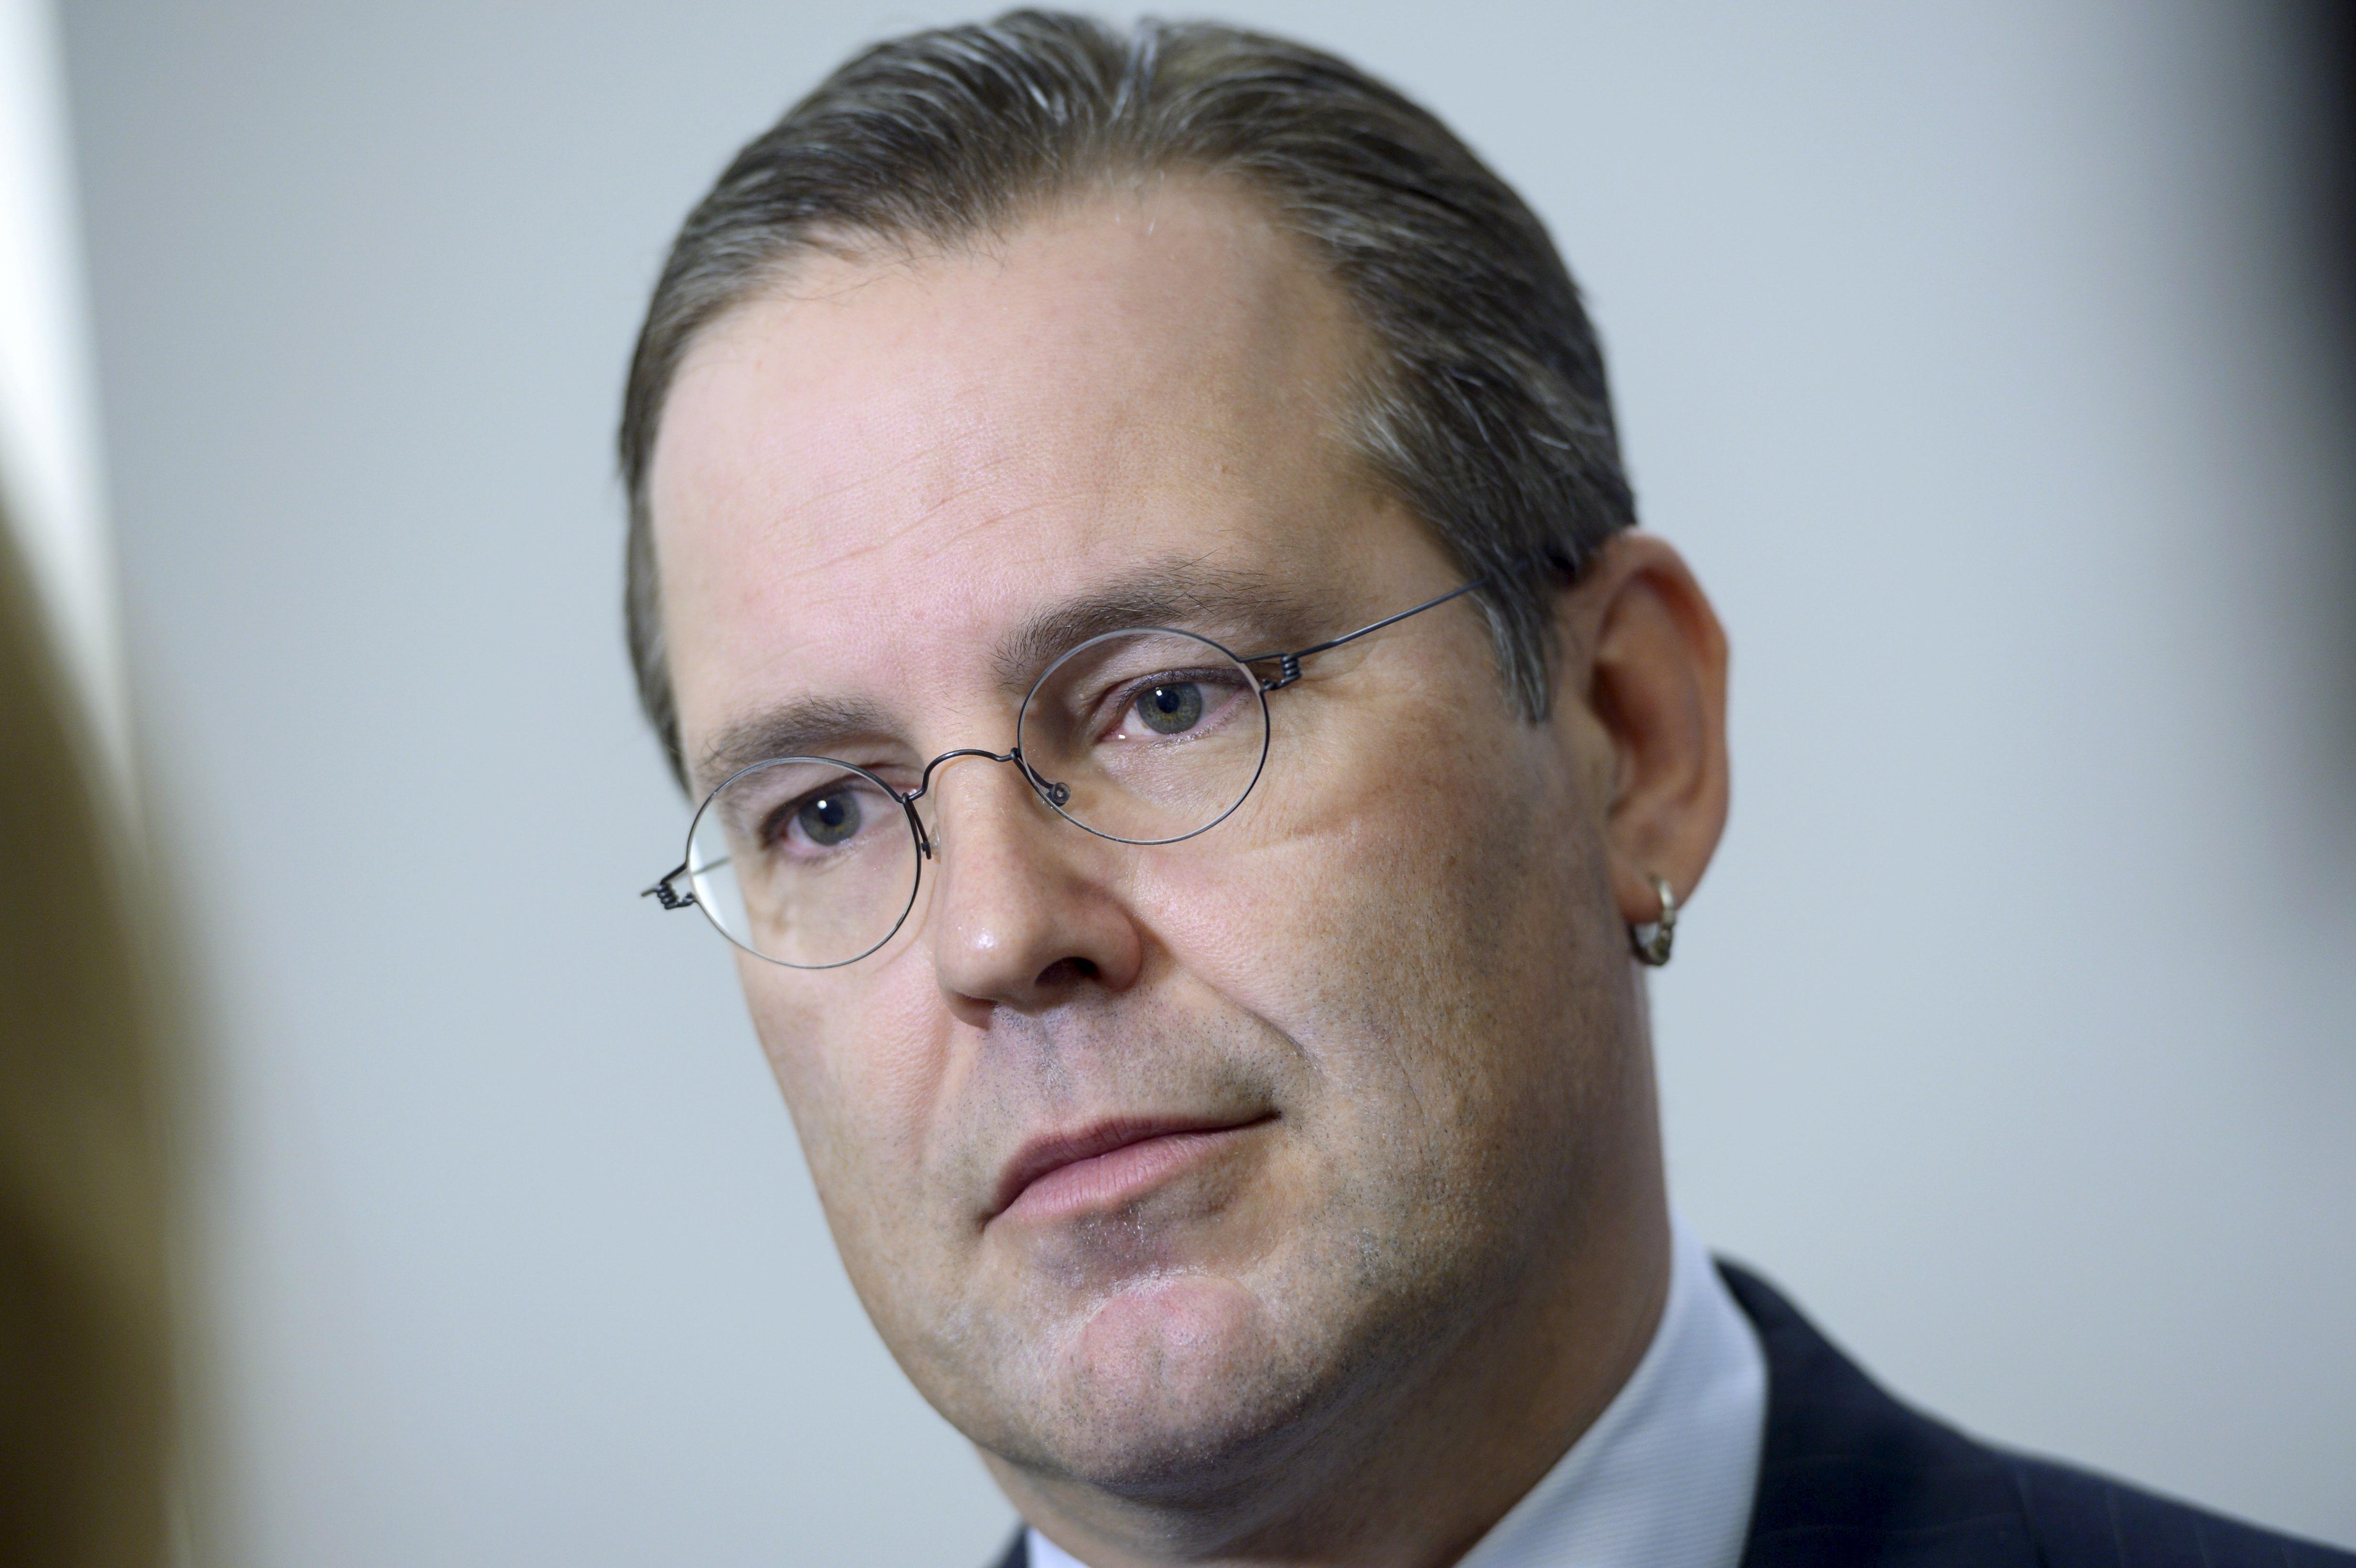 Borg fjarde basta finansministern